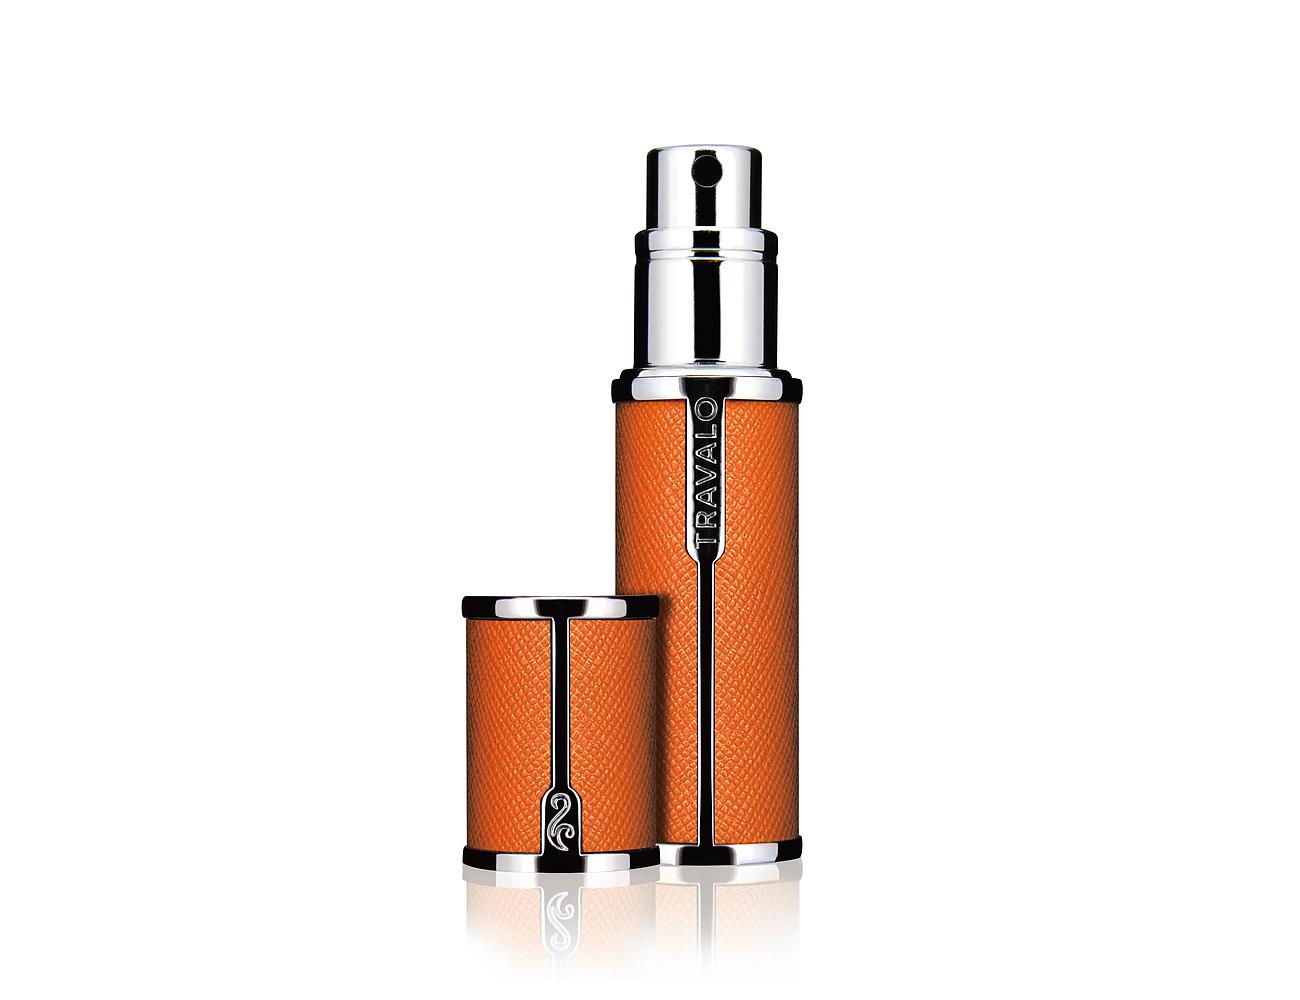 Milano Easy Fill Perfume Spray by Travalo